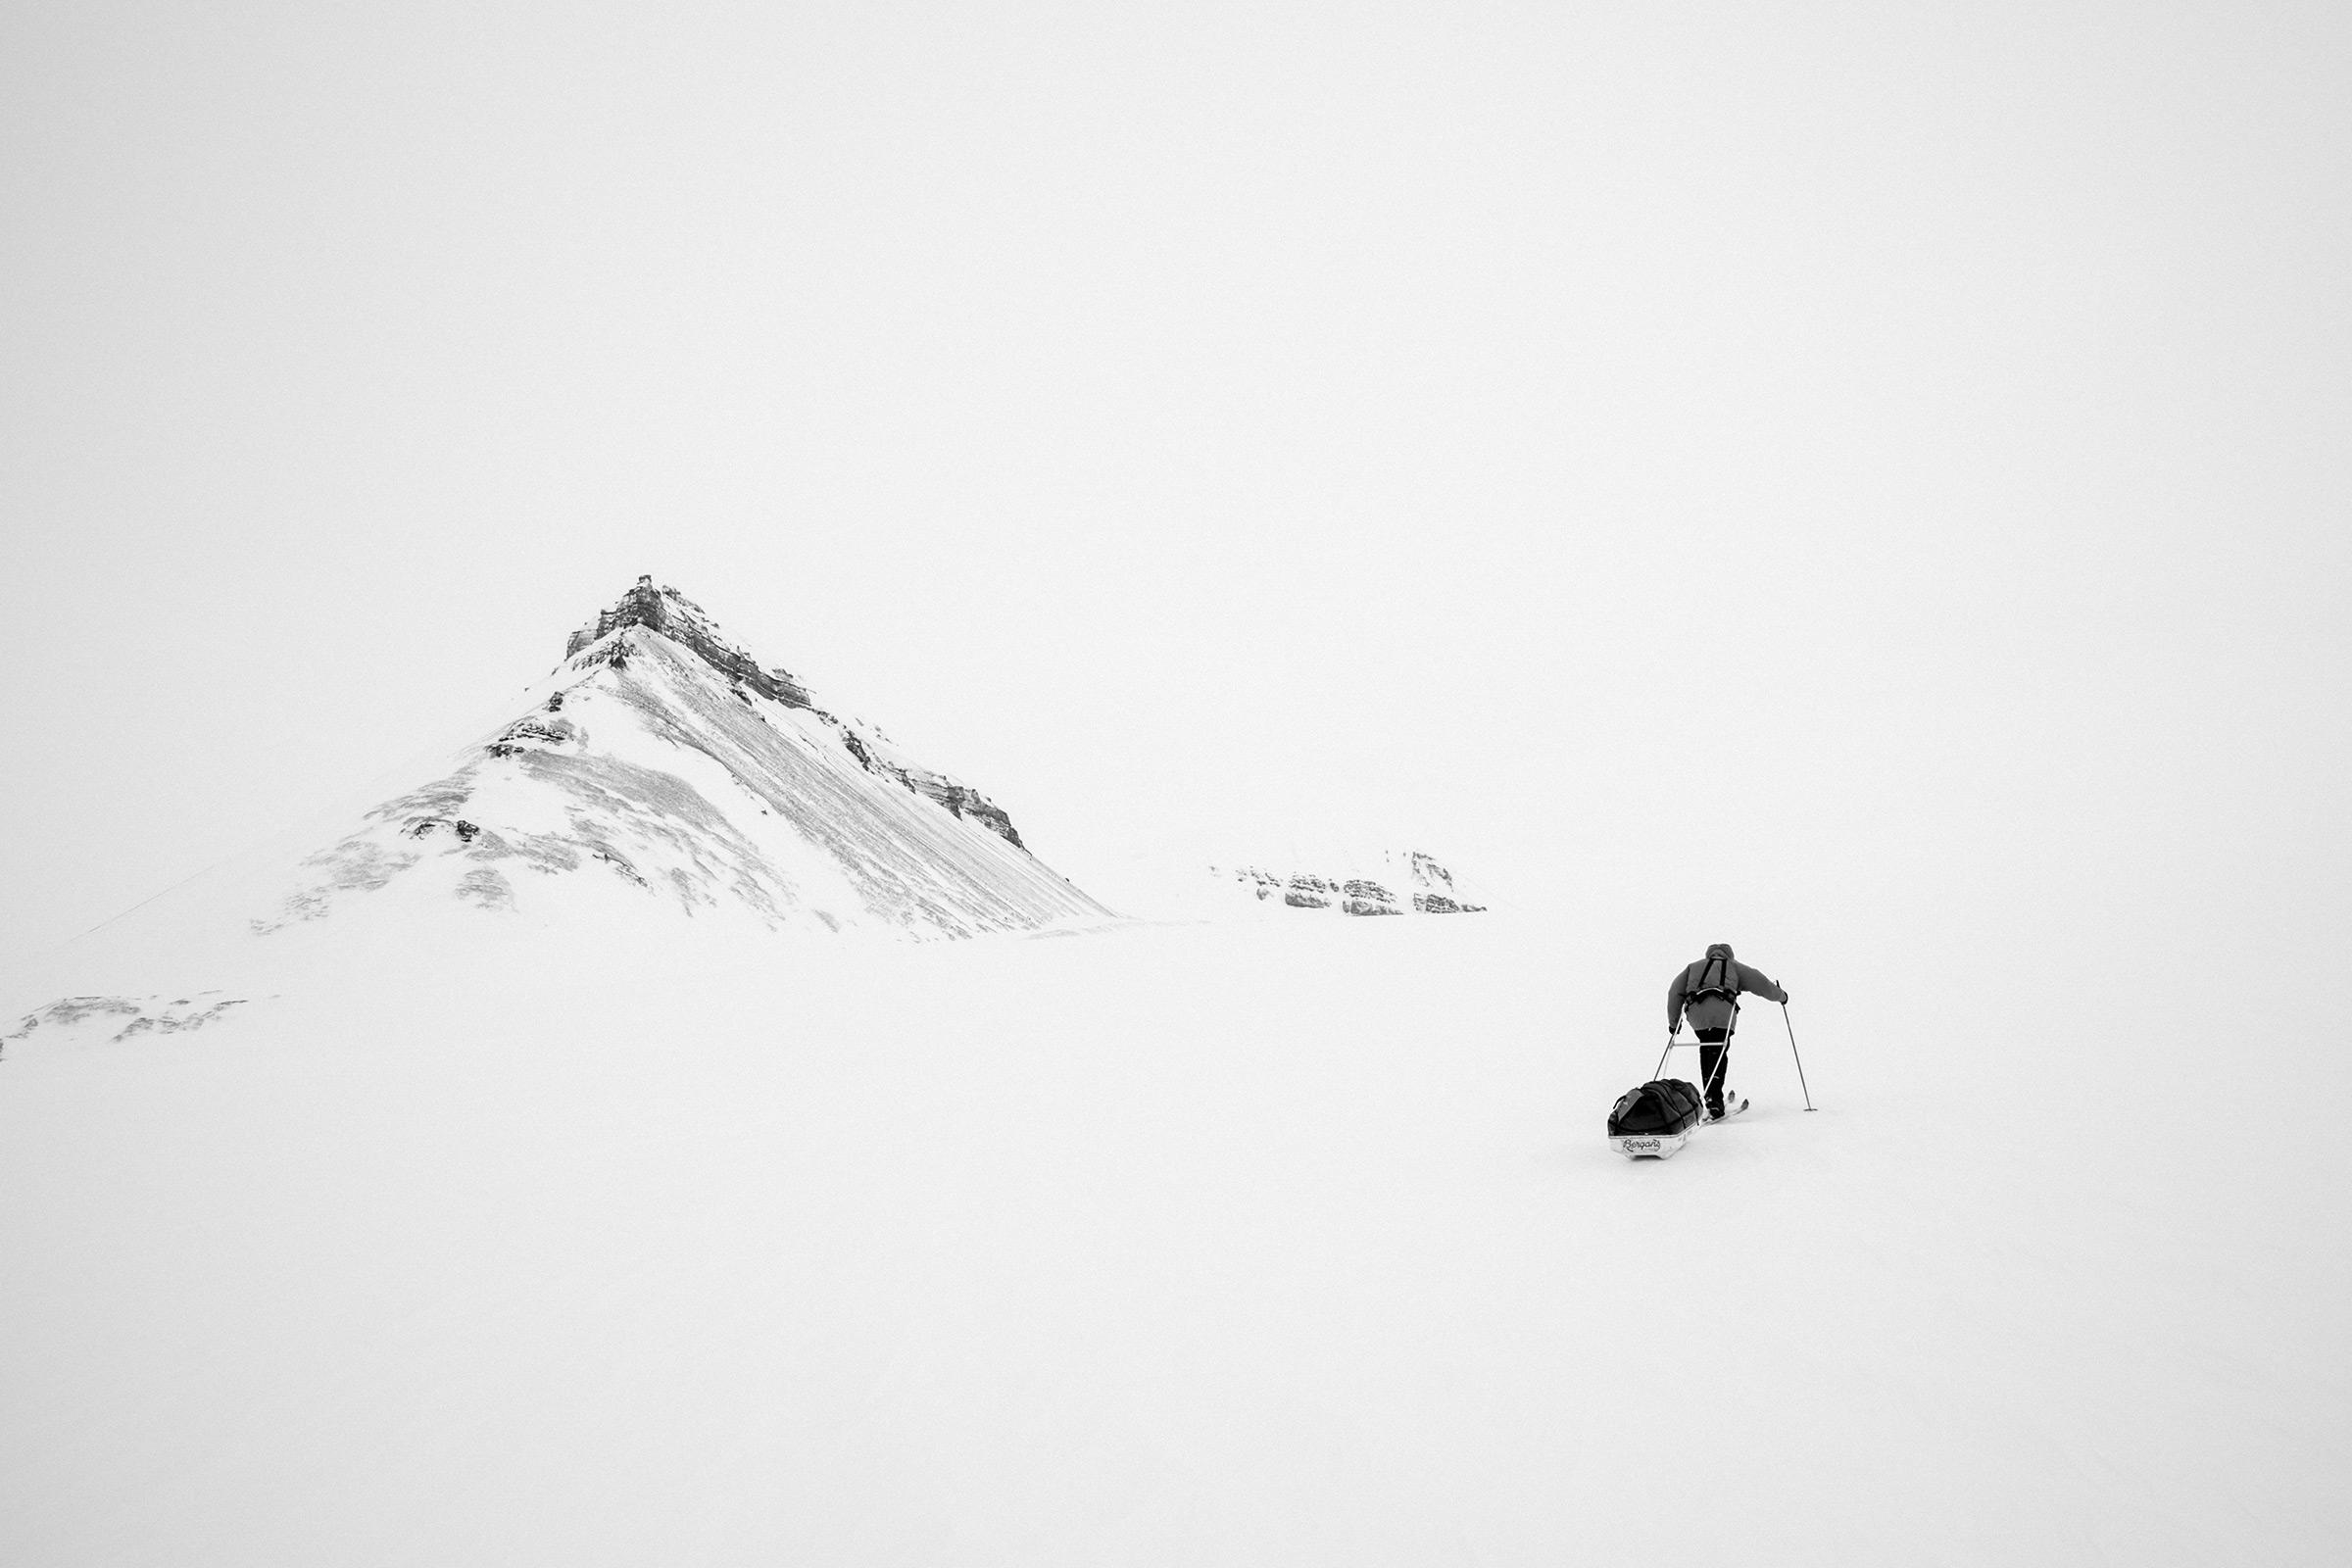 Svalbard, 2015 – I Like to Ski, Foto: Martin Hülle